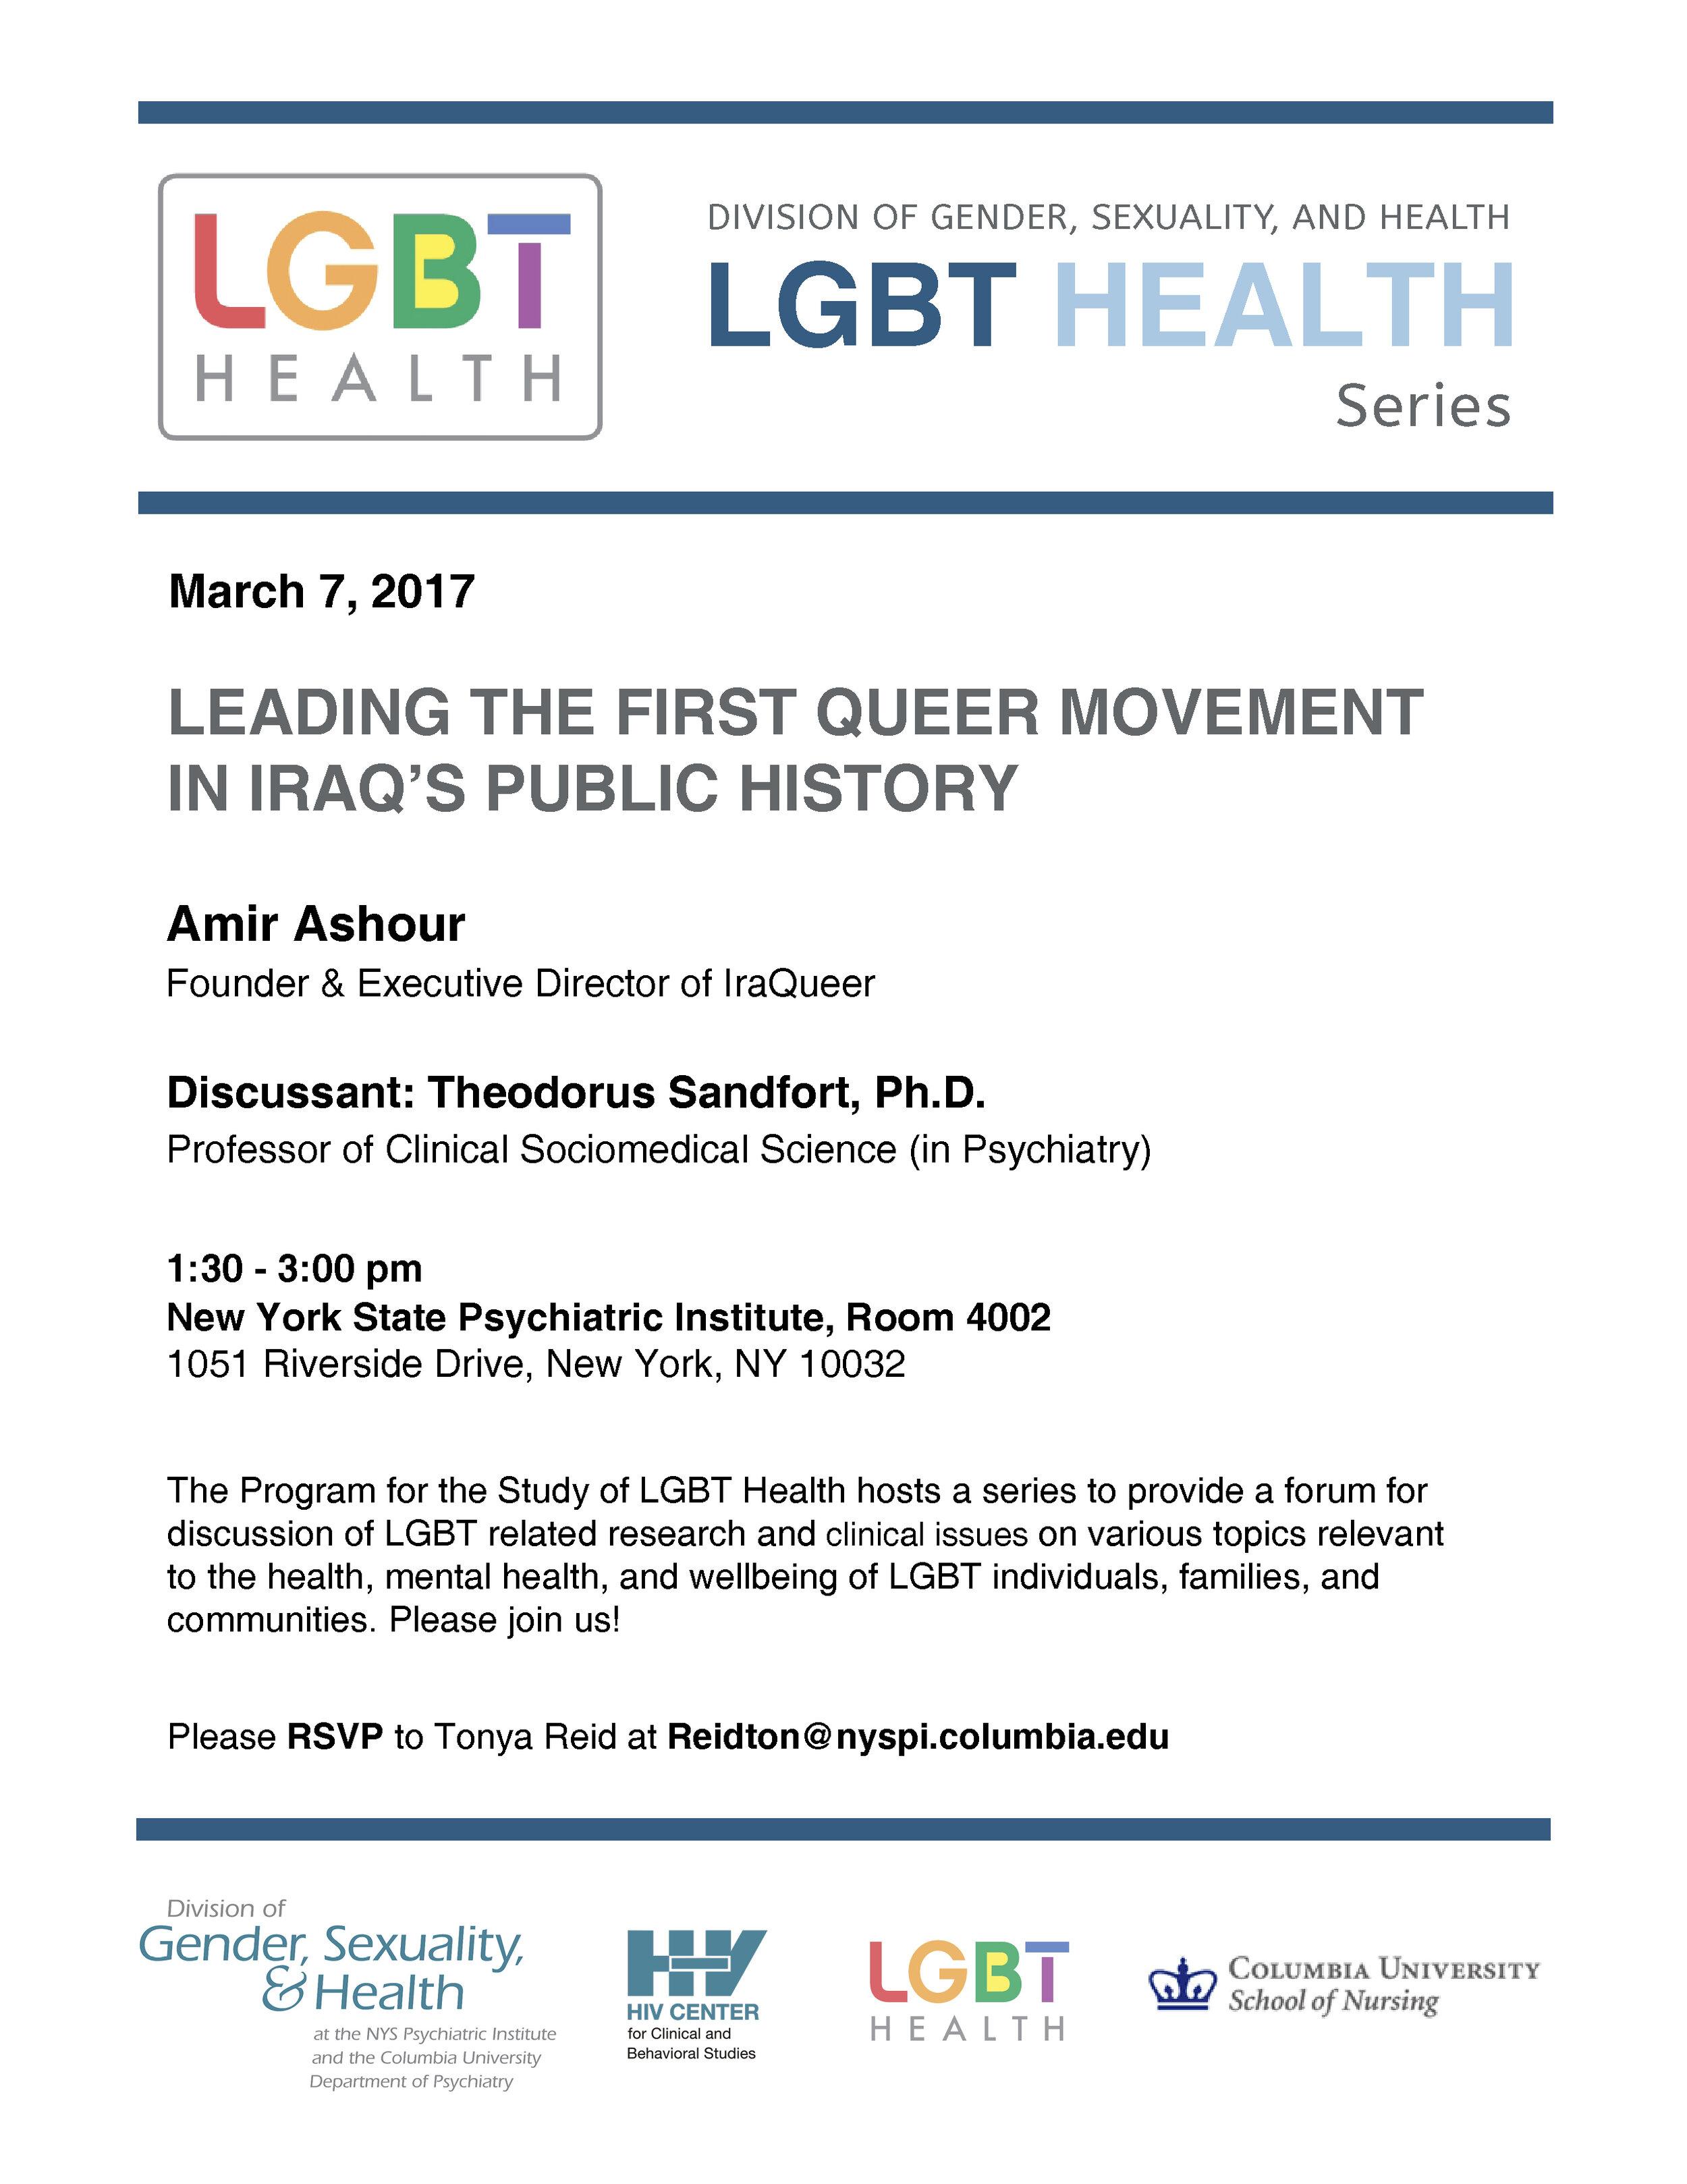 LGBT Health Series March 7 2017.jpg